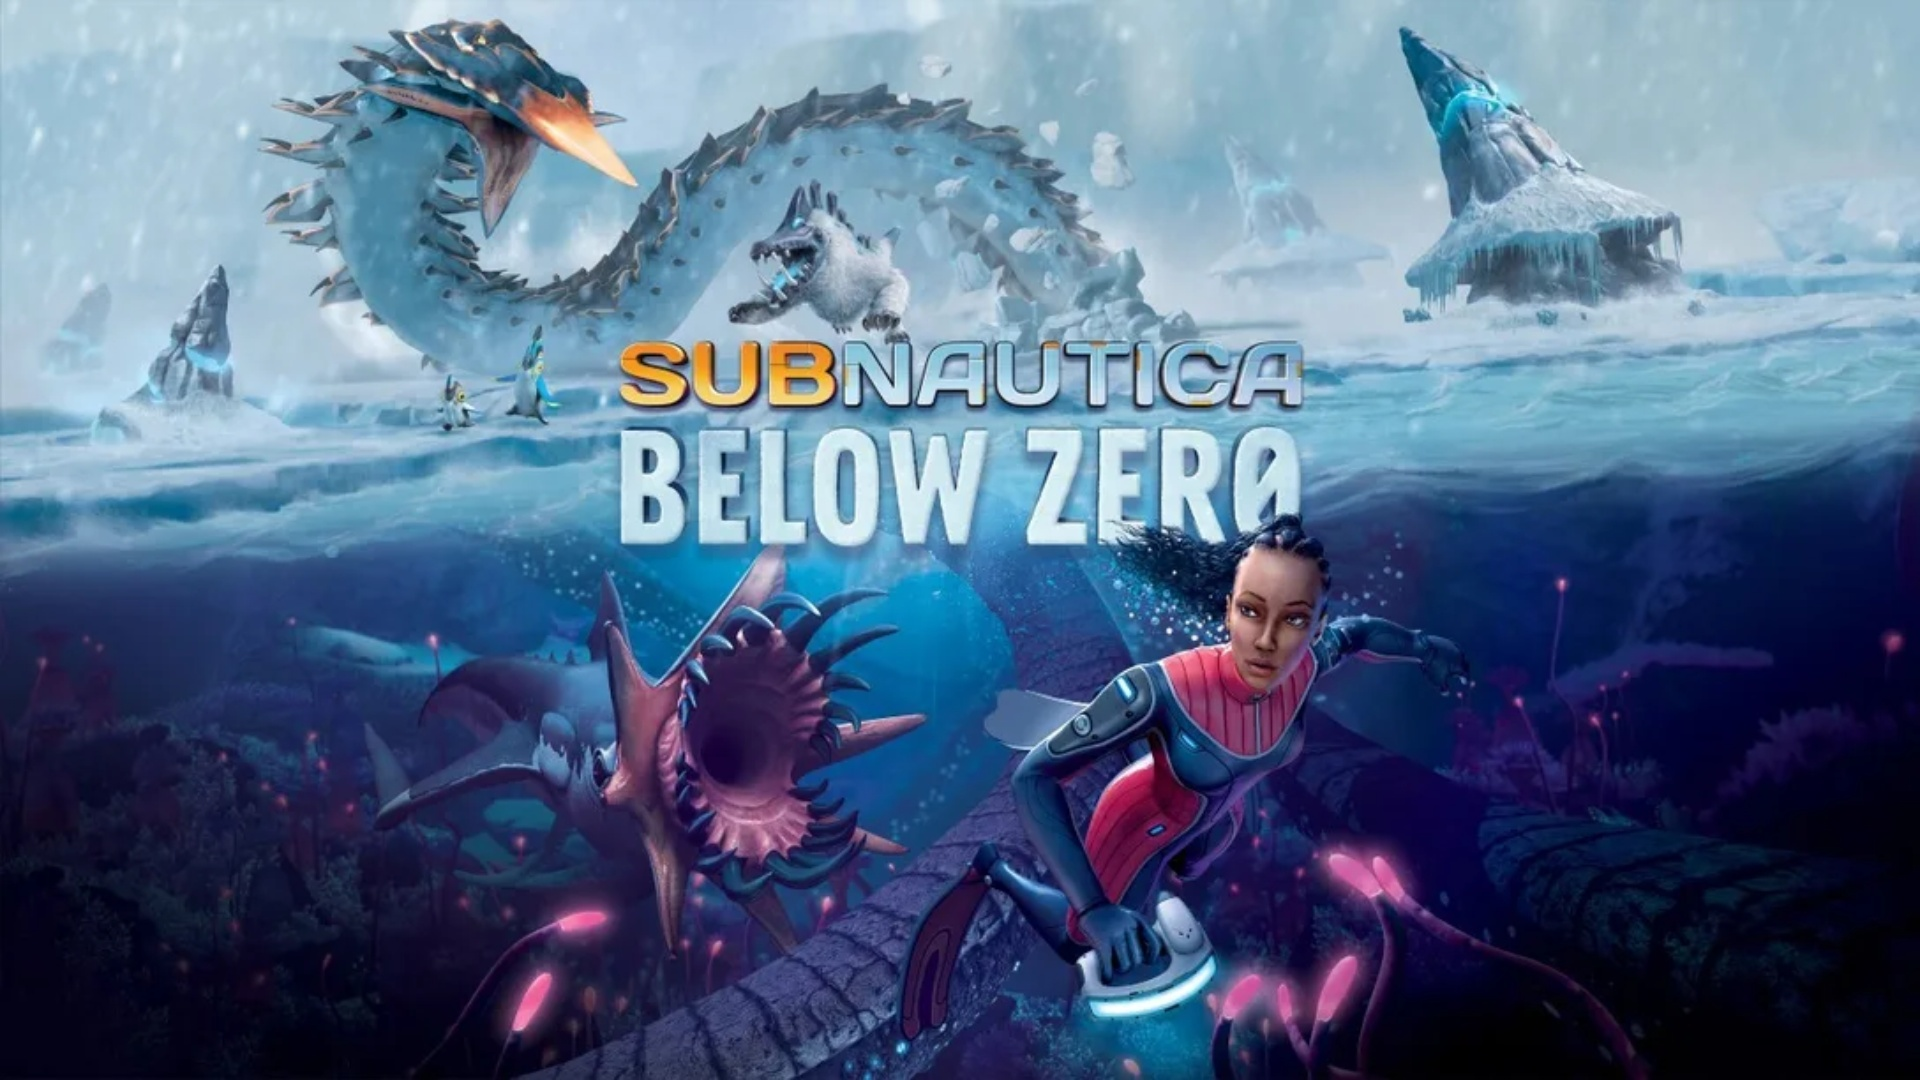 State of Play - Subnautica: Below Zero